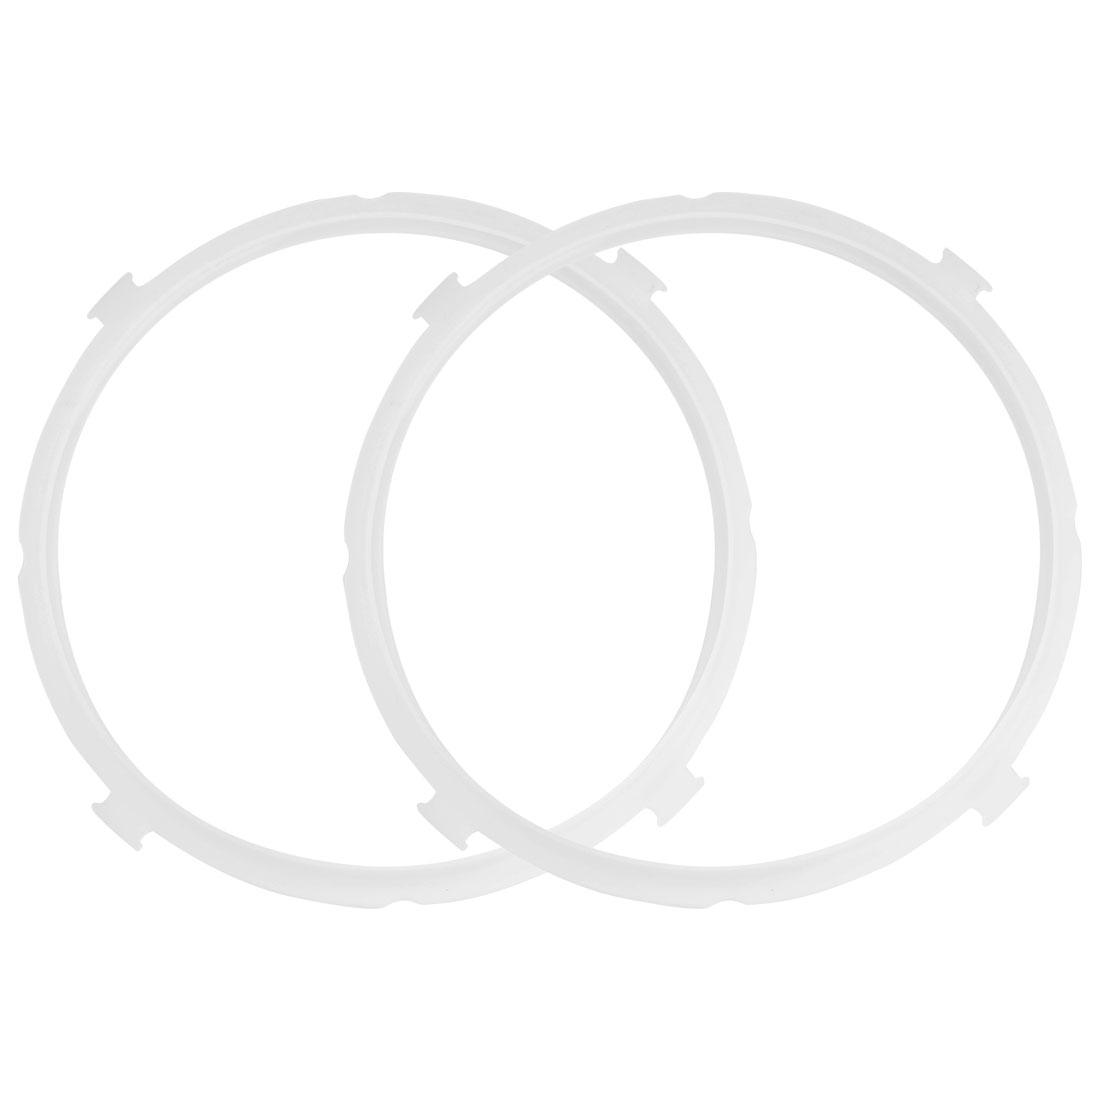 "2pcs Silicone Gasket Sealing Ring Sealer Inner Dia - 8.7"" , Fits 5/6 QT Models"